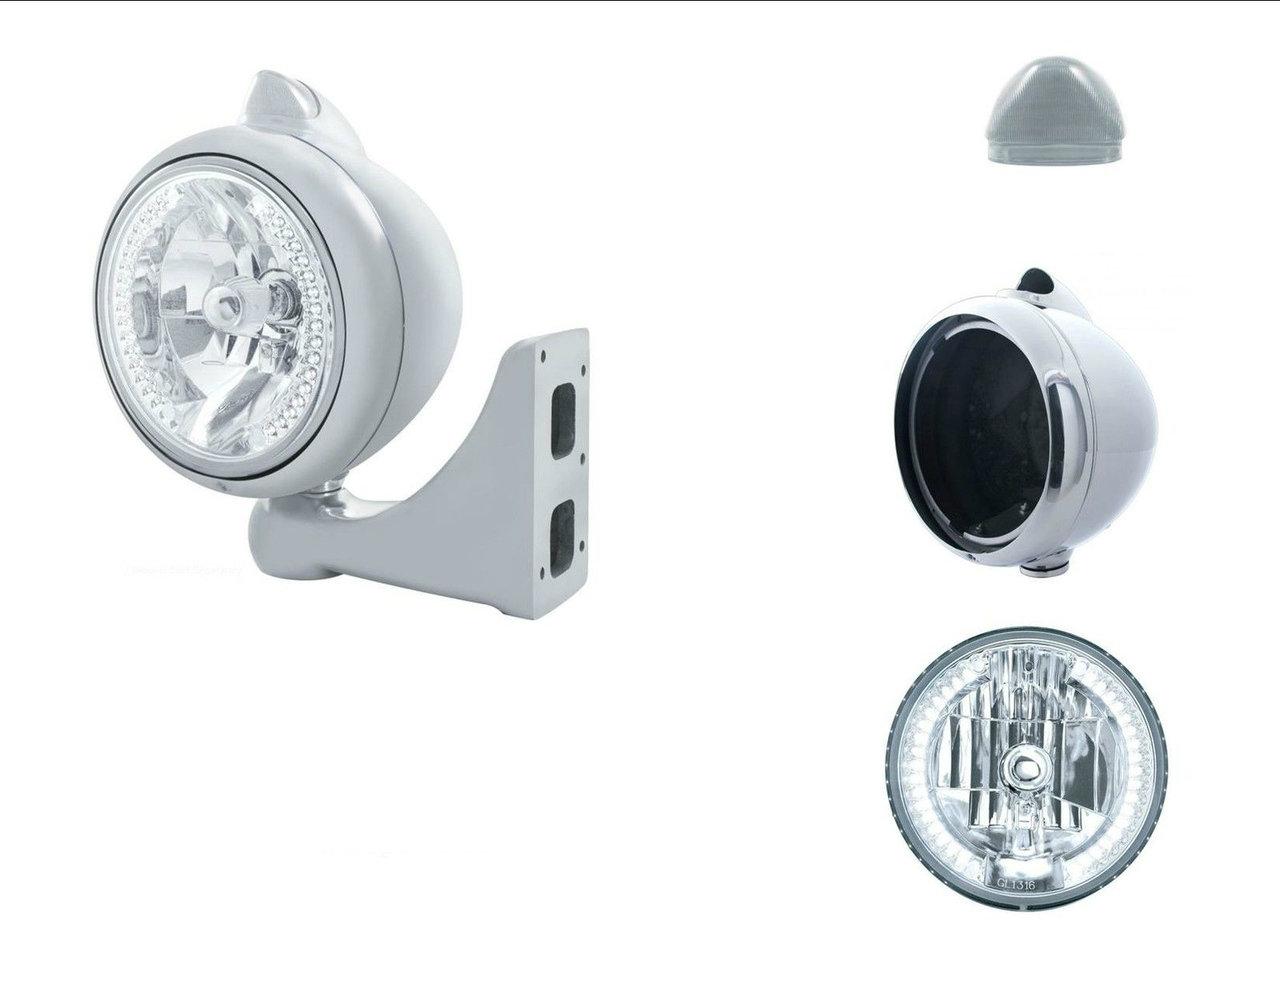 Peterbilt Kenworth Headlight - w/ 34 LED Headlamp and LED Signal (White/Clear)X1